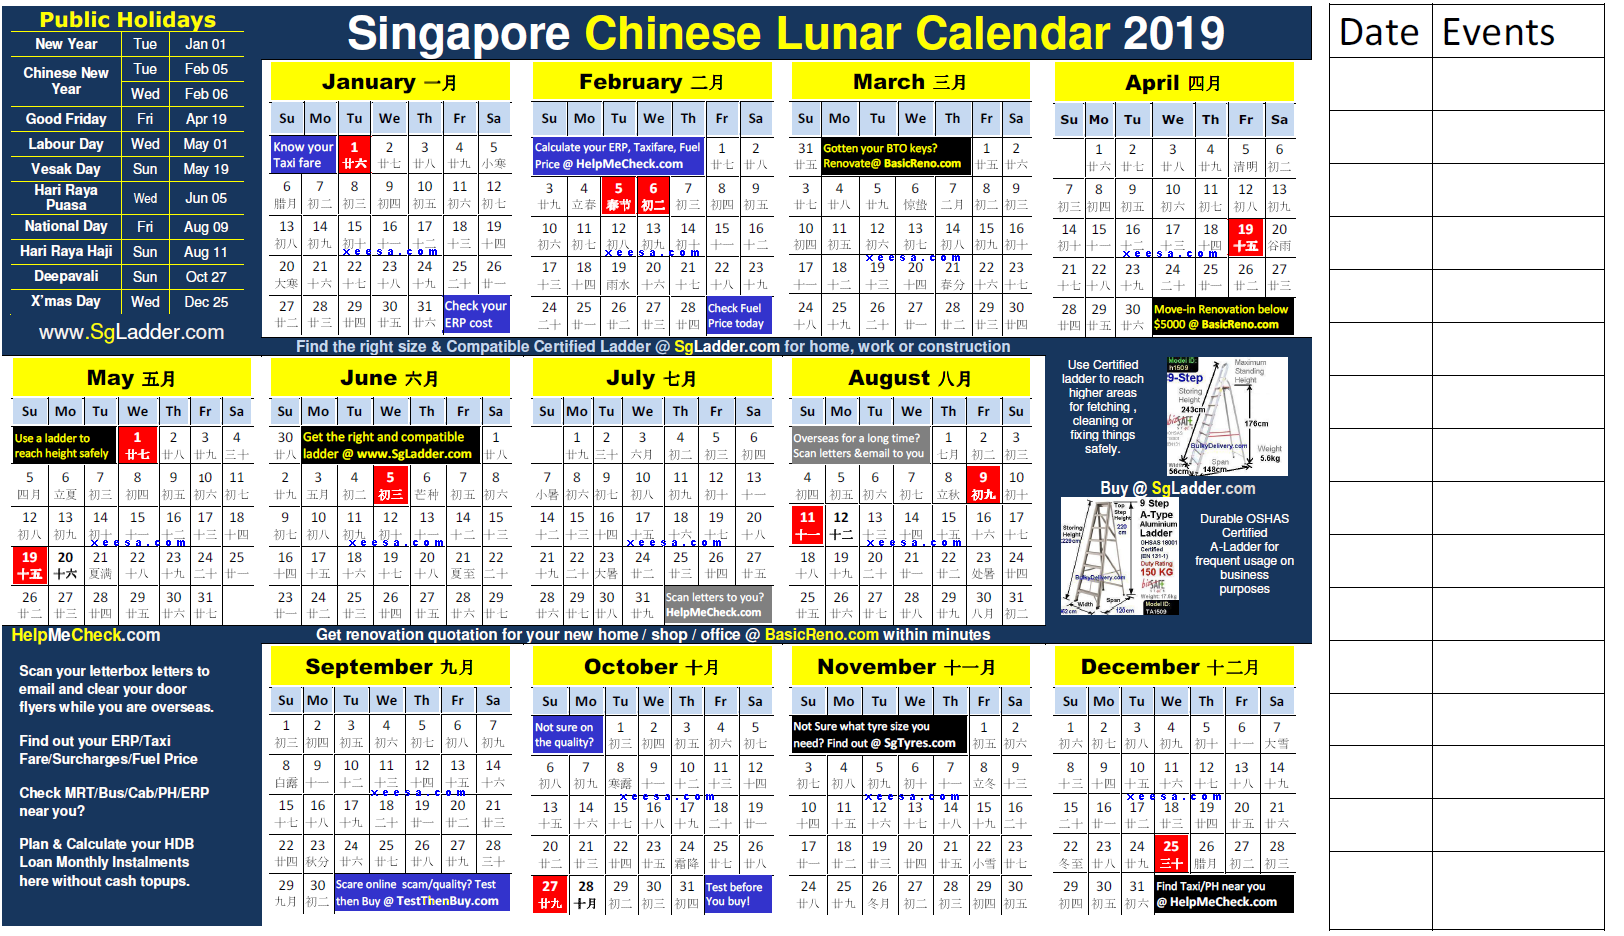 Chinese Lunar Calendar 2019 Free For Singapore